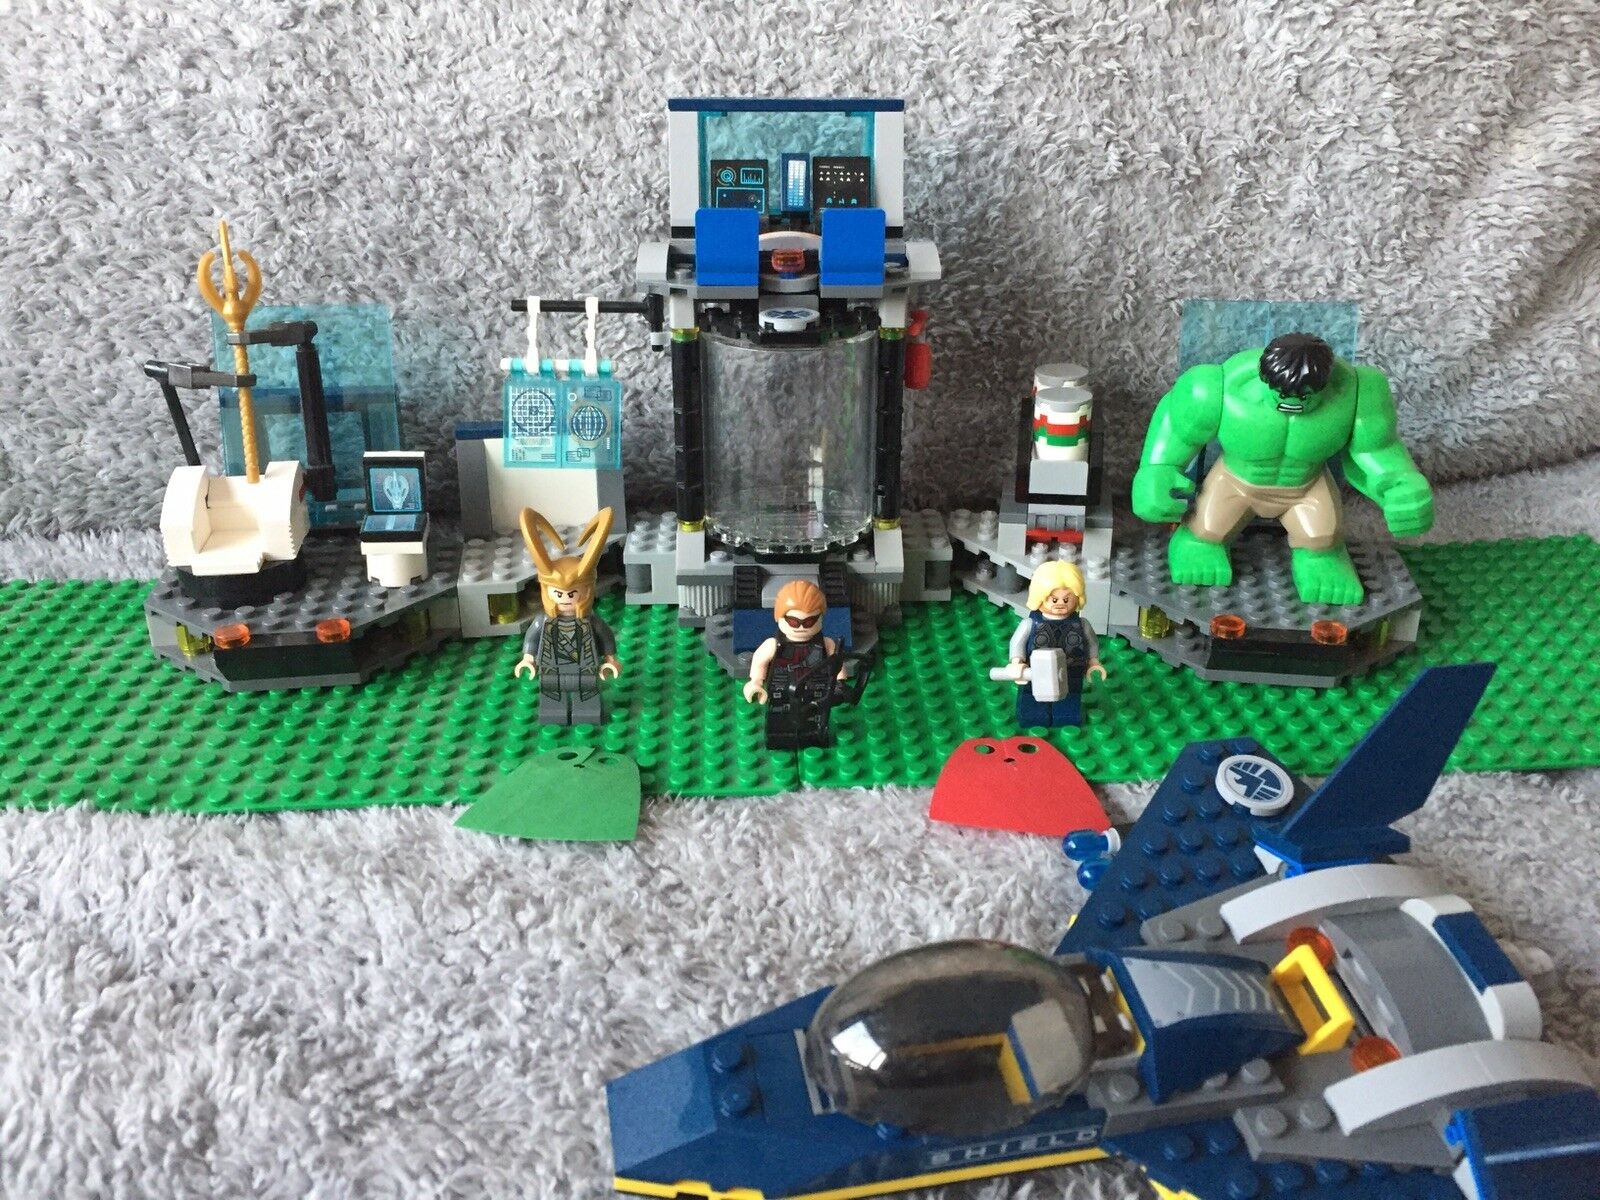 LEGO 6868 Marvel Super Heroes Hulk's Helicarrier Breakout